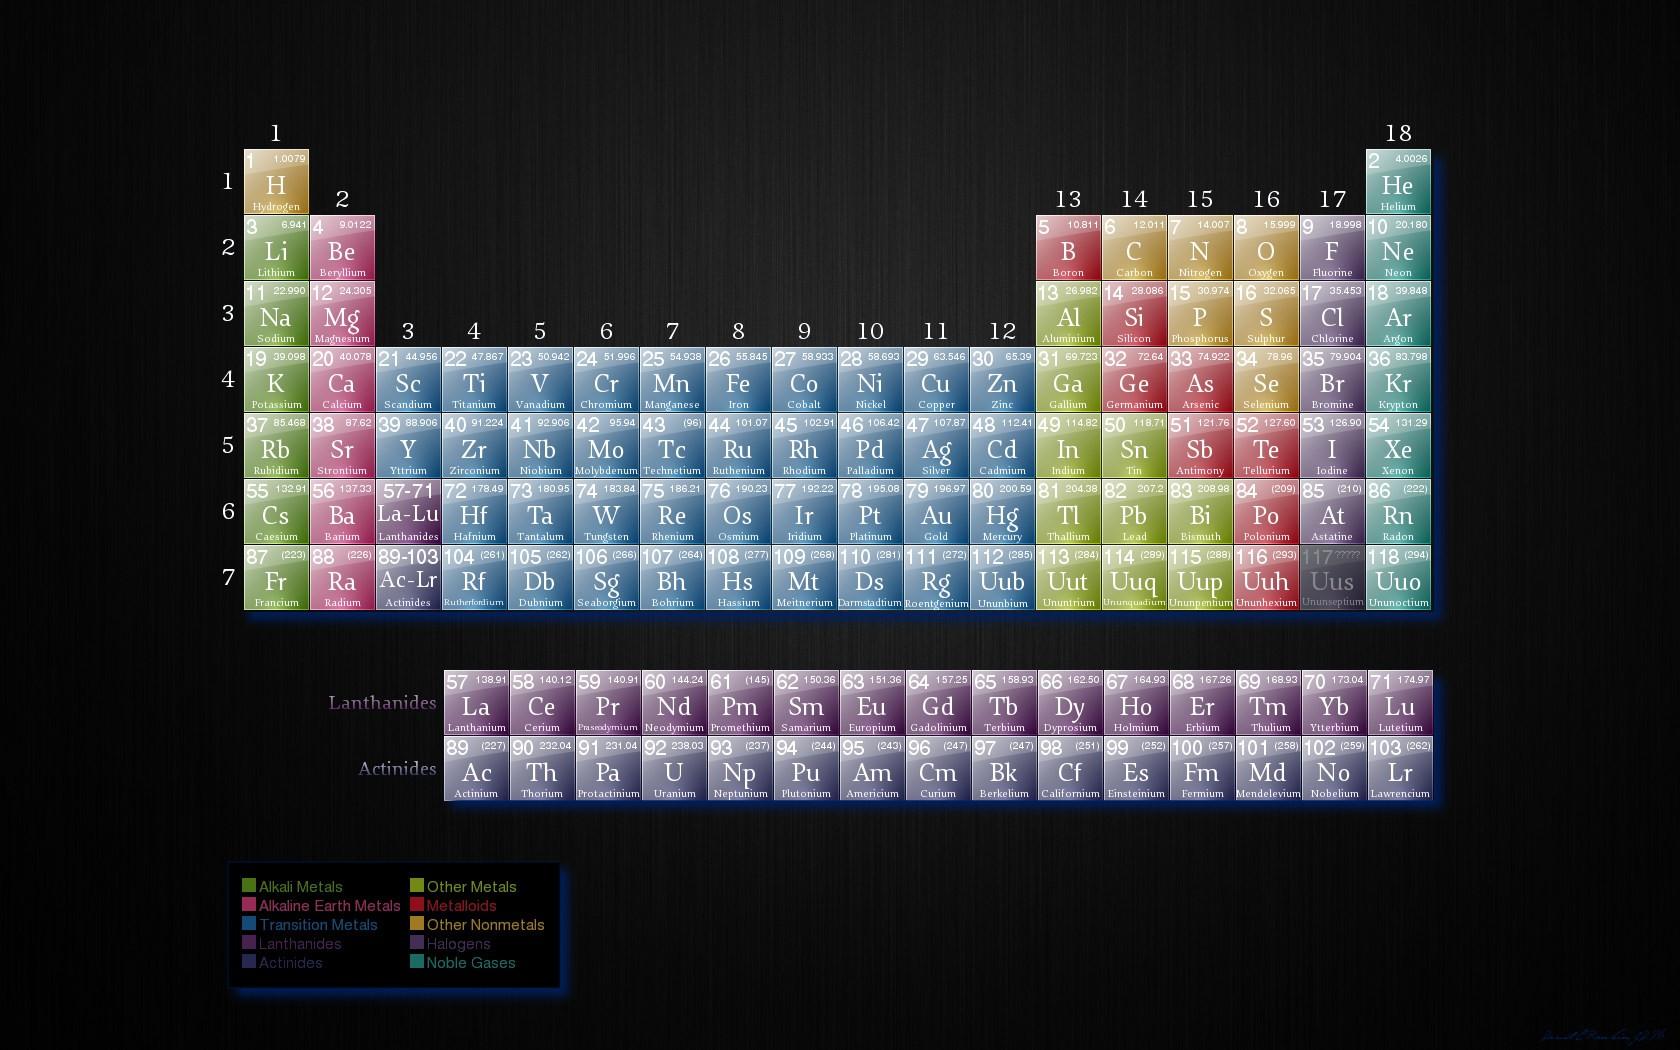 Fondos de pantalla qumica tabla peridica color forma juegos qumica tabla peridica color forma juegos captura de pantalla dispositivo de demostracion urtaz Choice Image